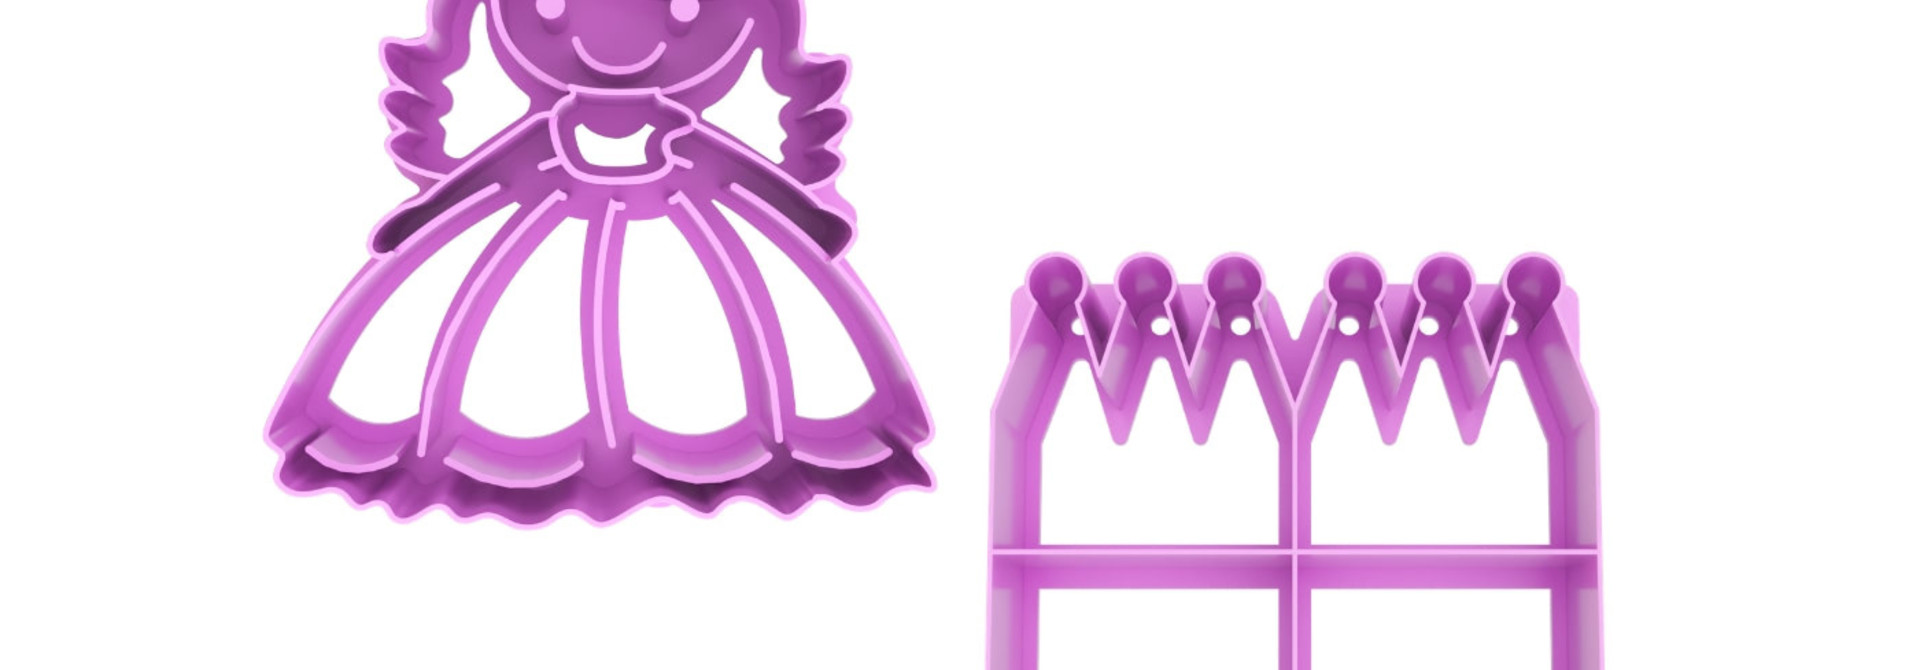 Lunch Punch Sandwich Cutters - Princess